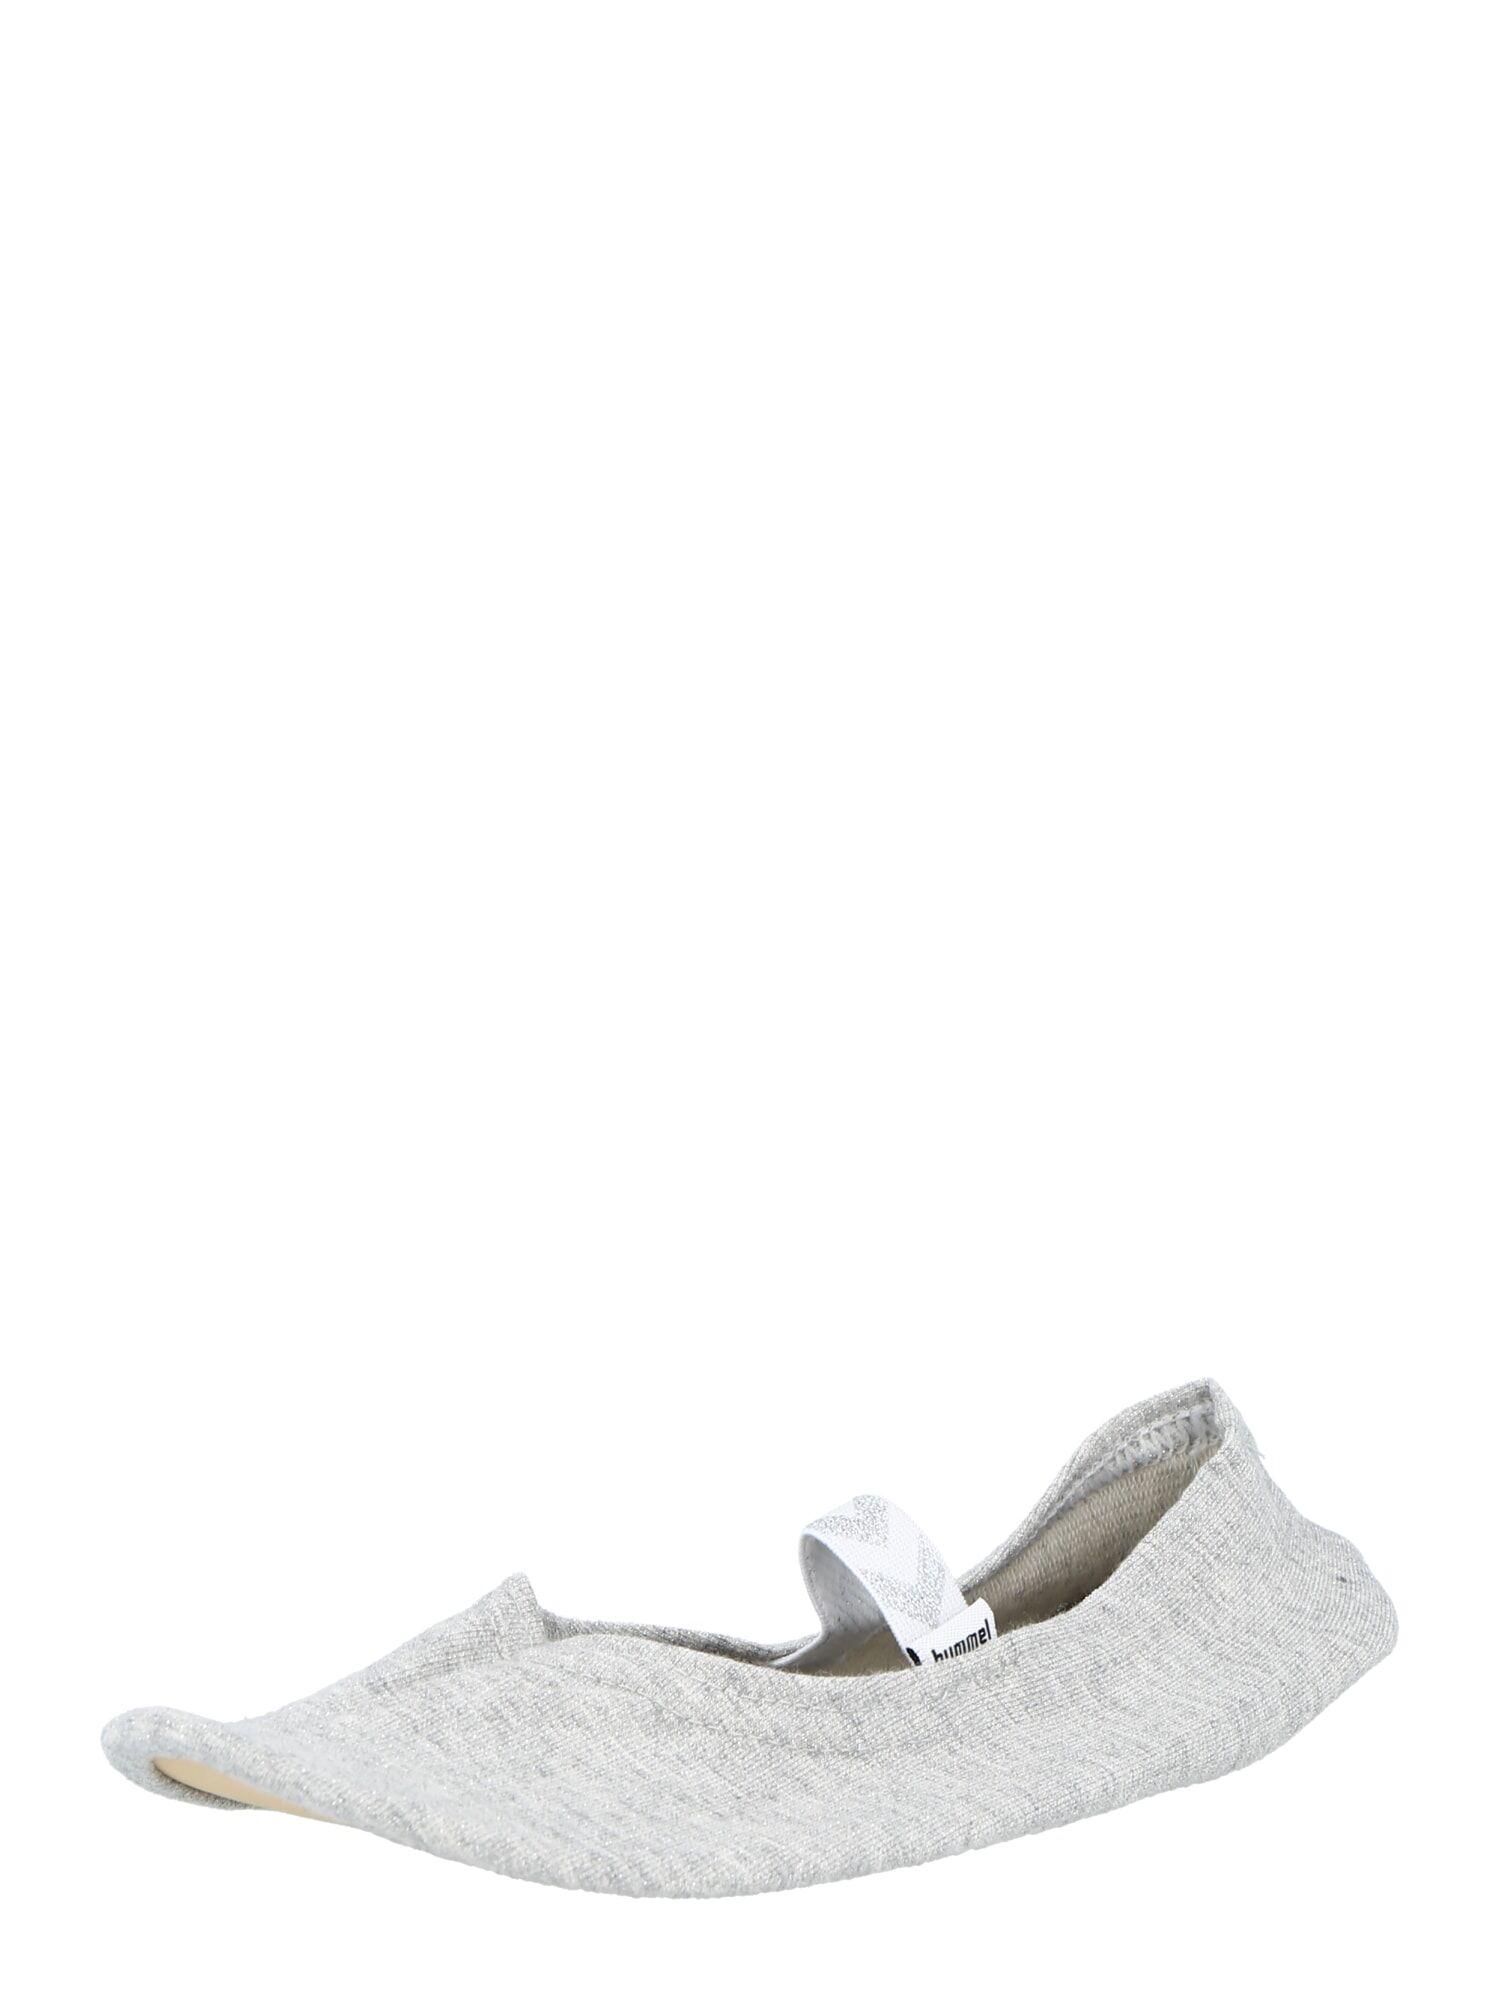 Hummel Chaussure de sport  - Gris - Taille: 36 - boy